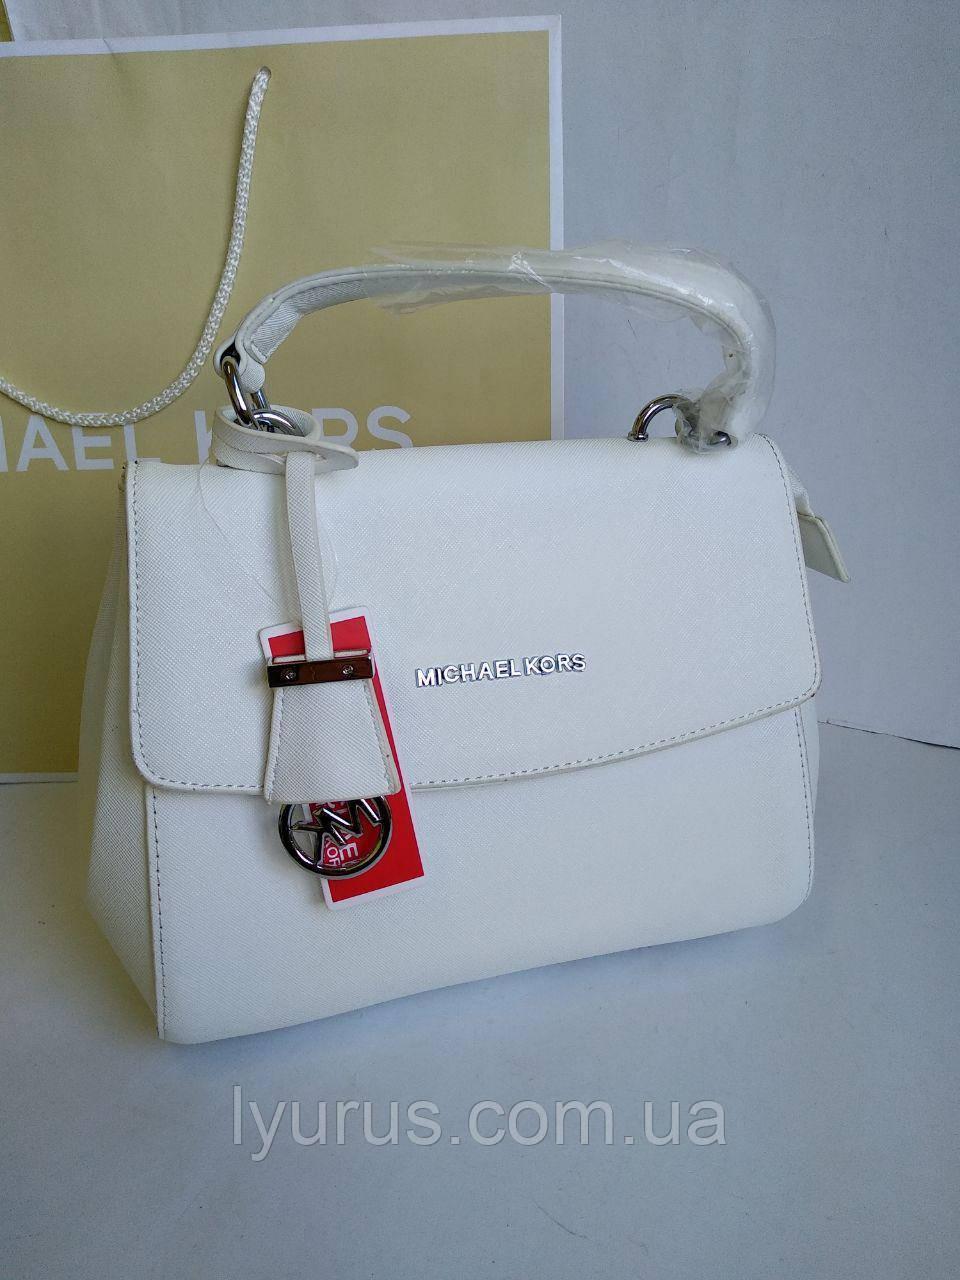 0c5bc64b4ac8 Женская сумка Michael Kors Ava белая: продажа, цена в Полтаве ...